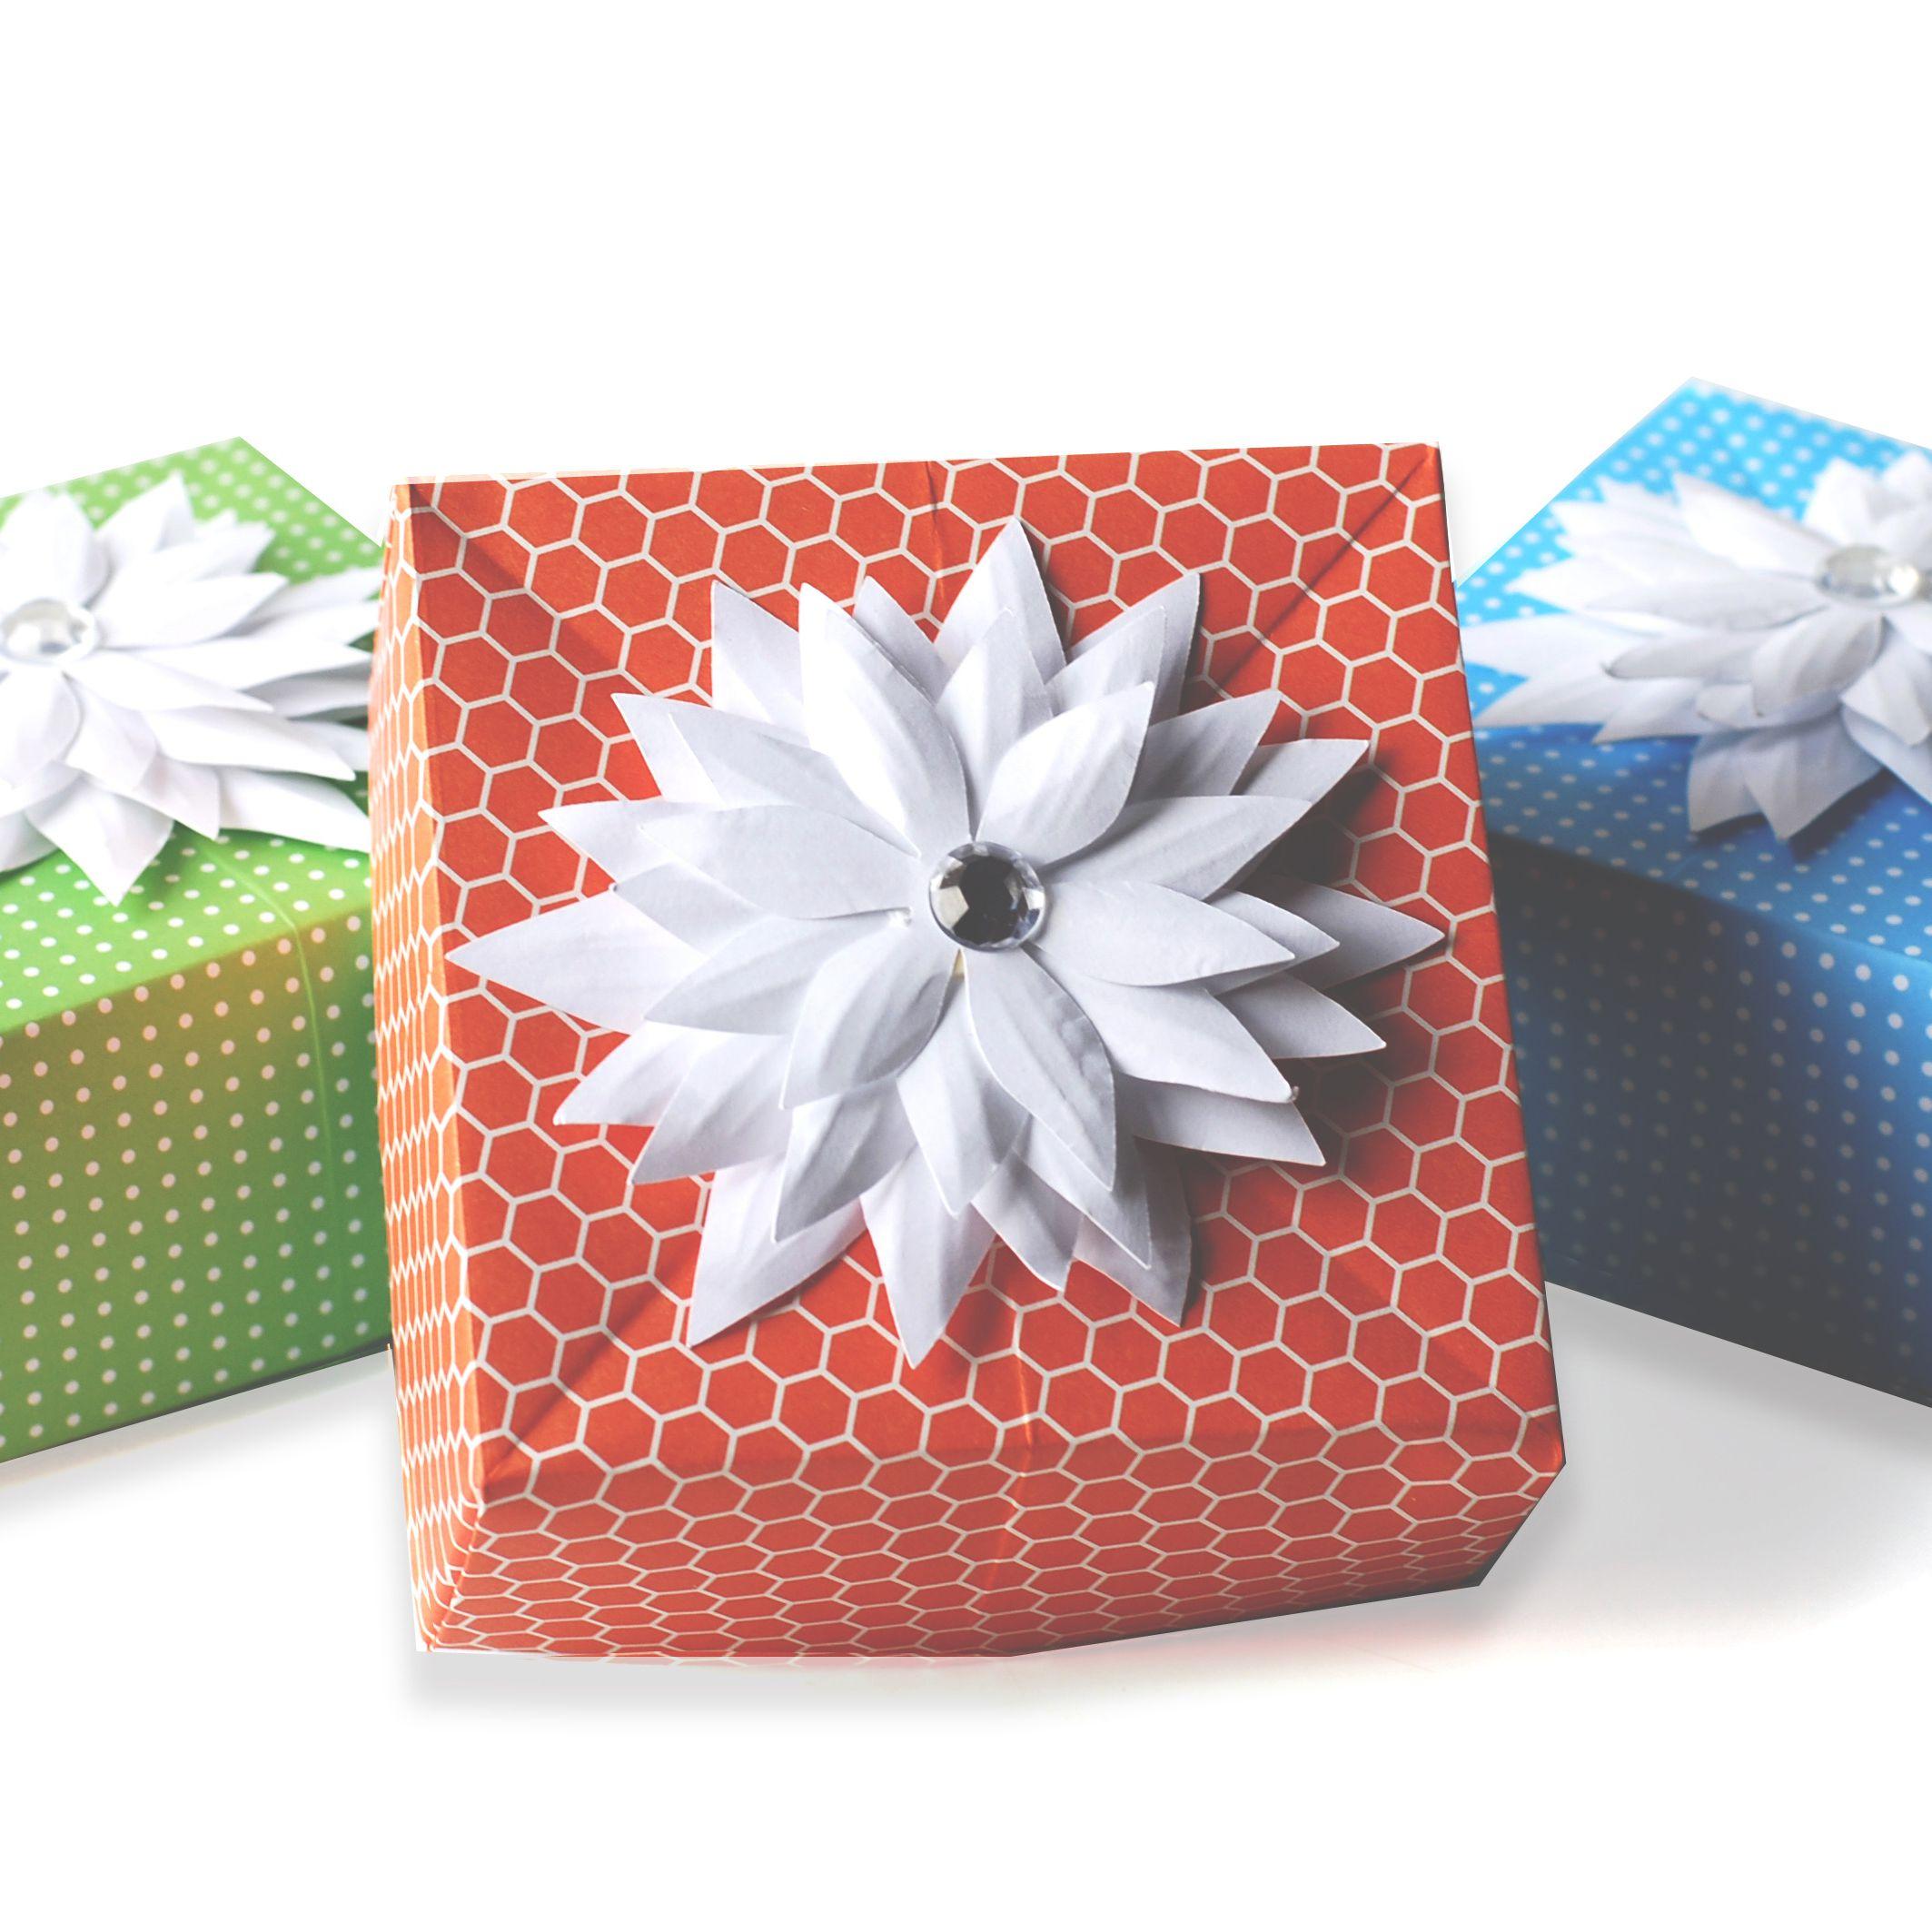 Gift Box White Vigo 12x9x4 With Lid Easy to Assemble No Glue | Etsy | 2127x2127